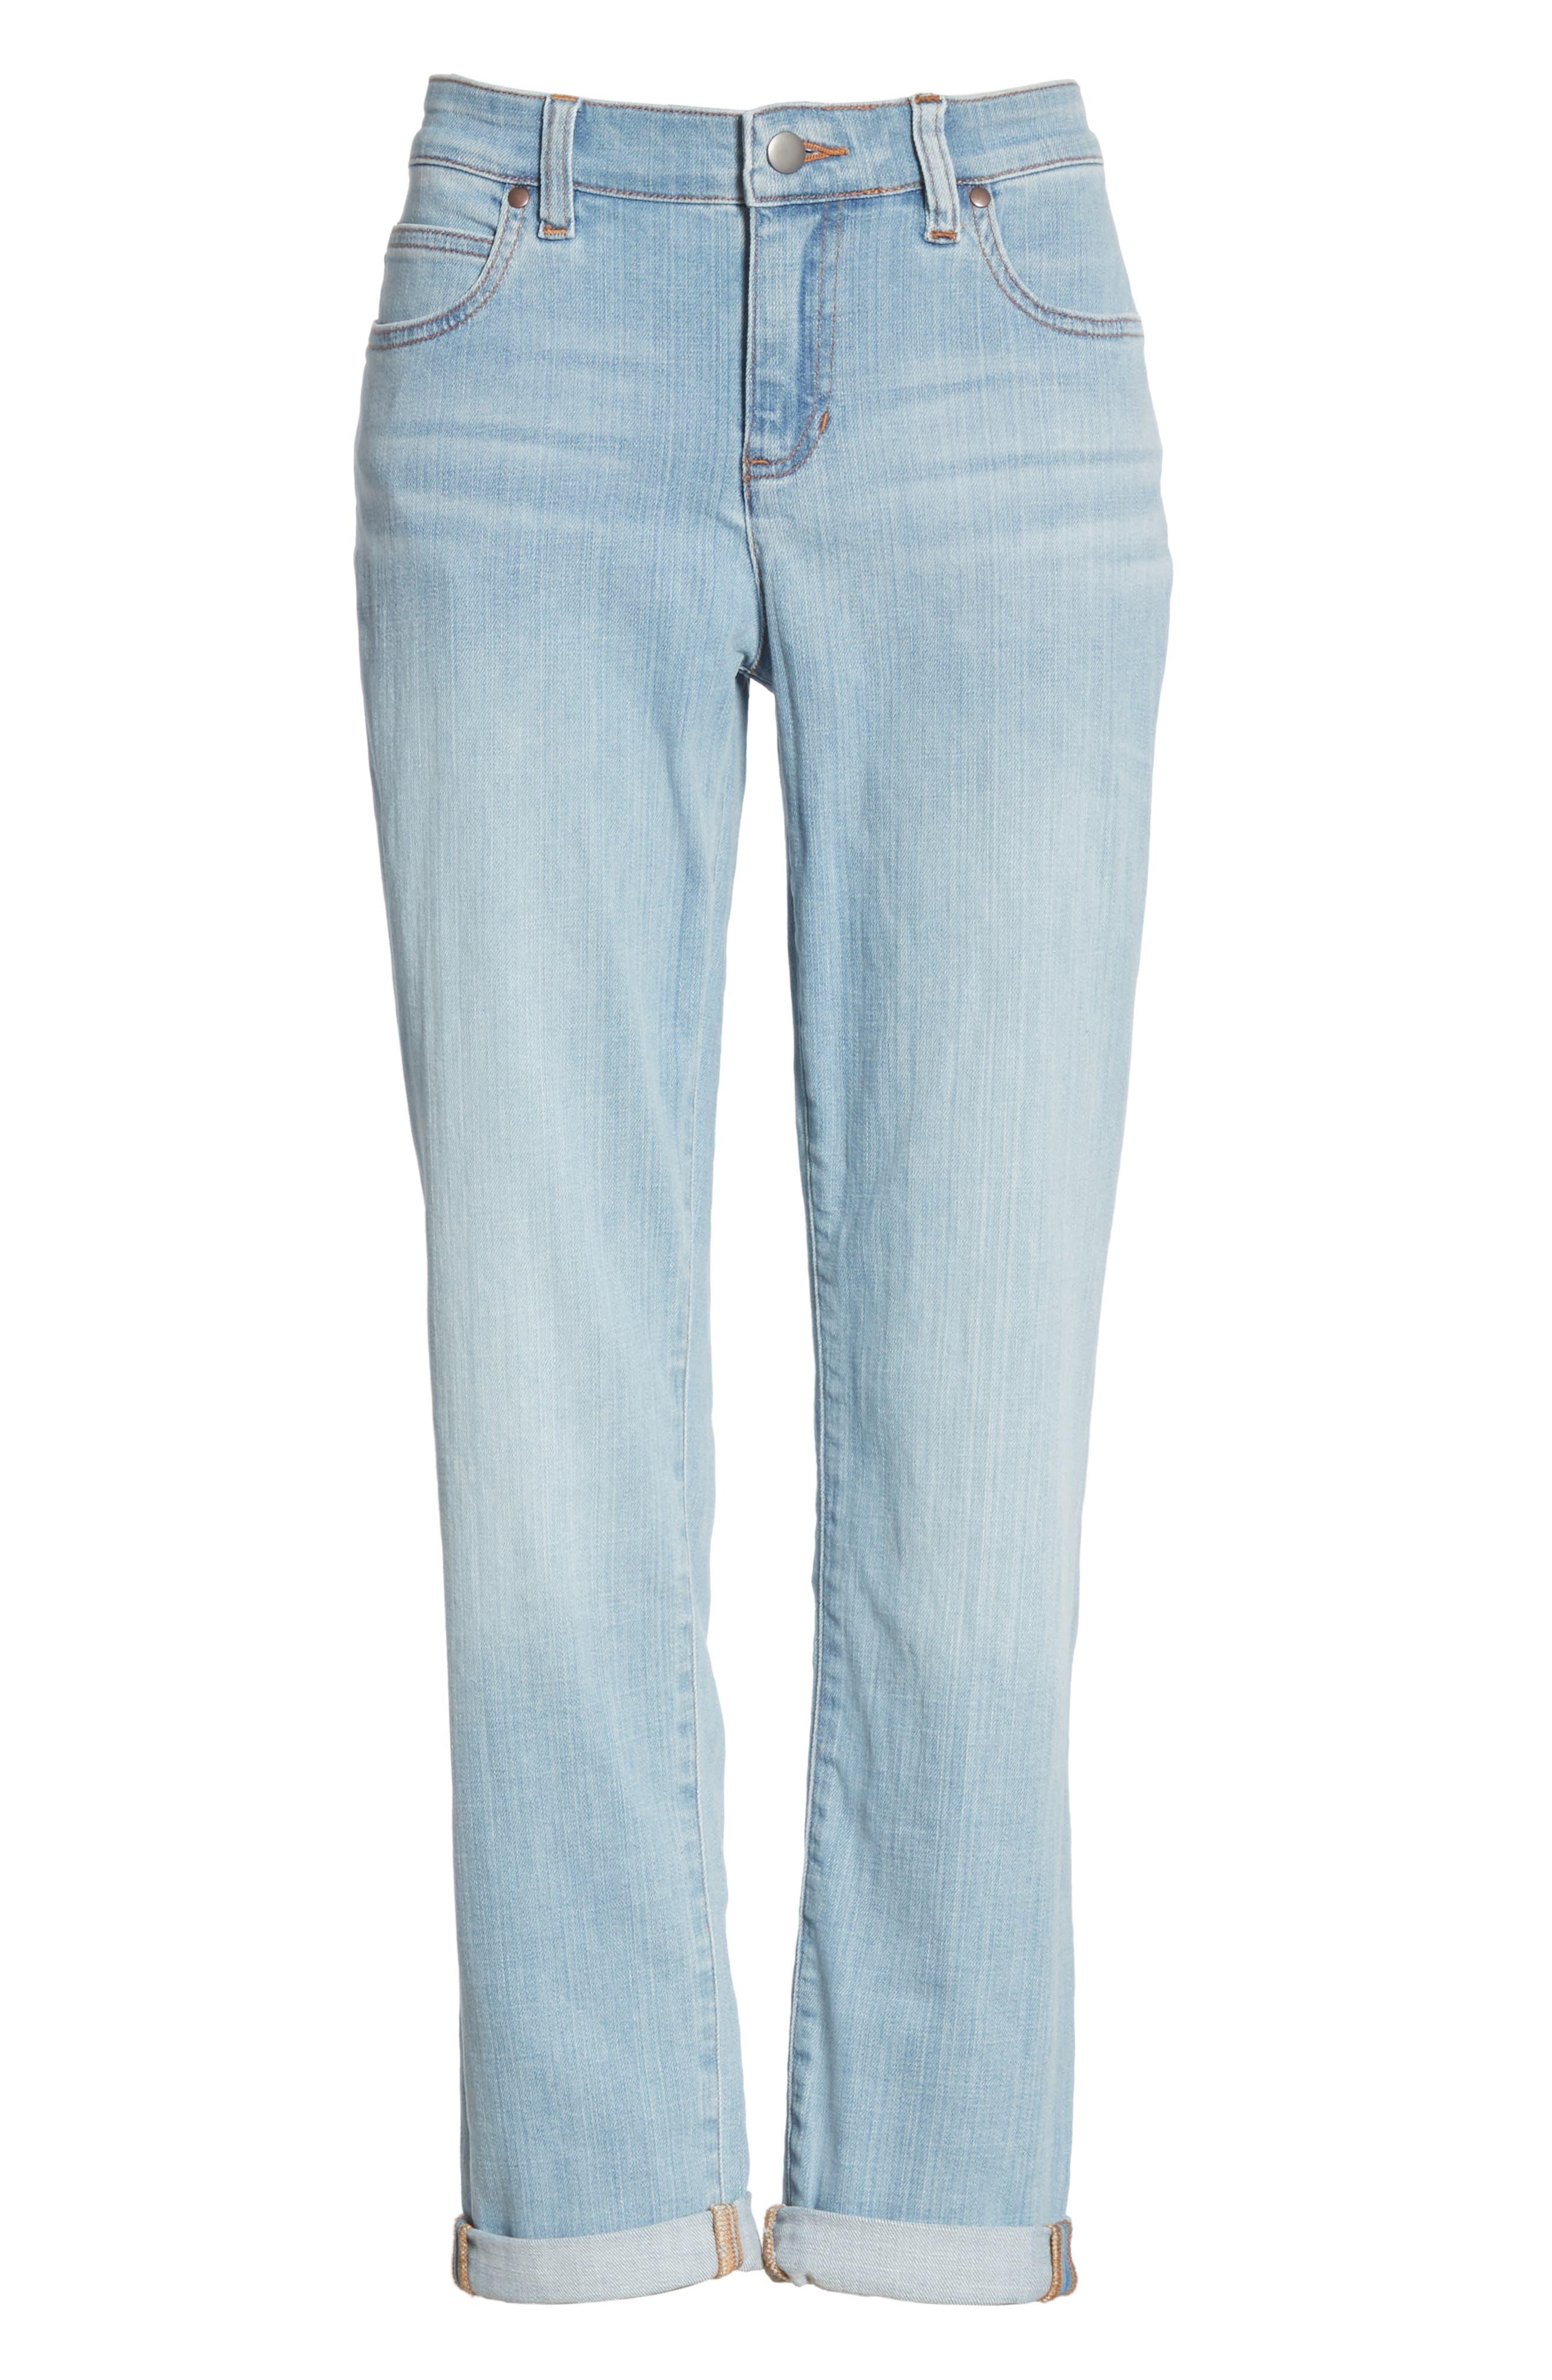 EILEEN FISHER, Organic Cotton Boyfriend Jeans, Alternate thumbnail 7, color, ICE BLUE